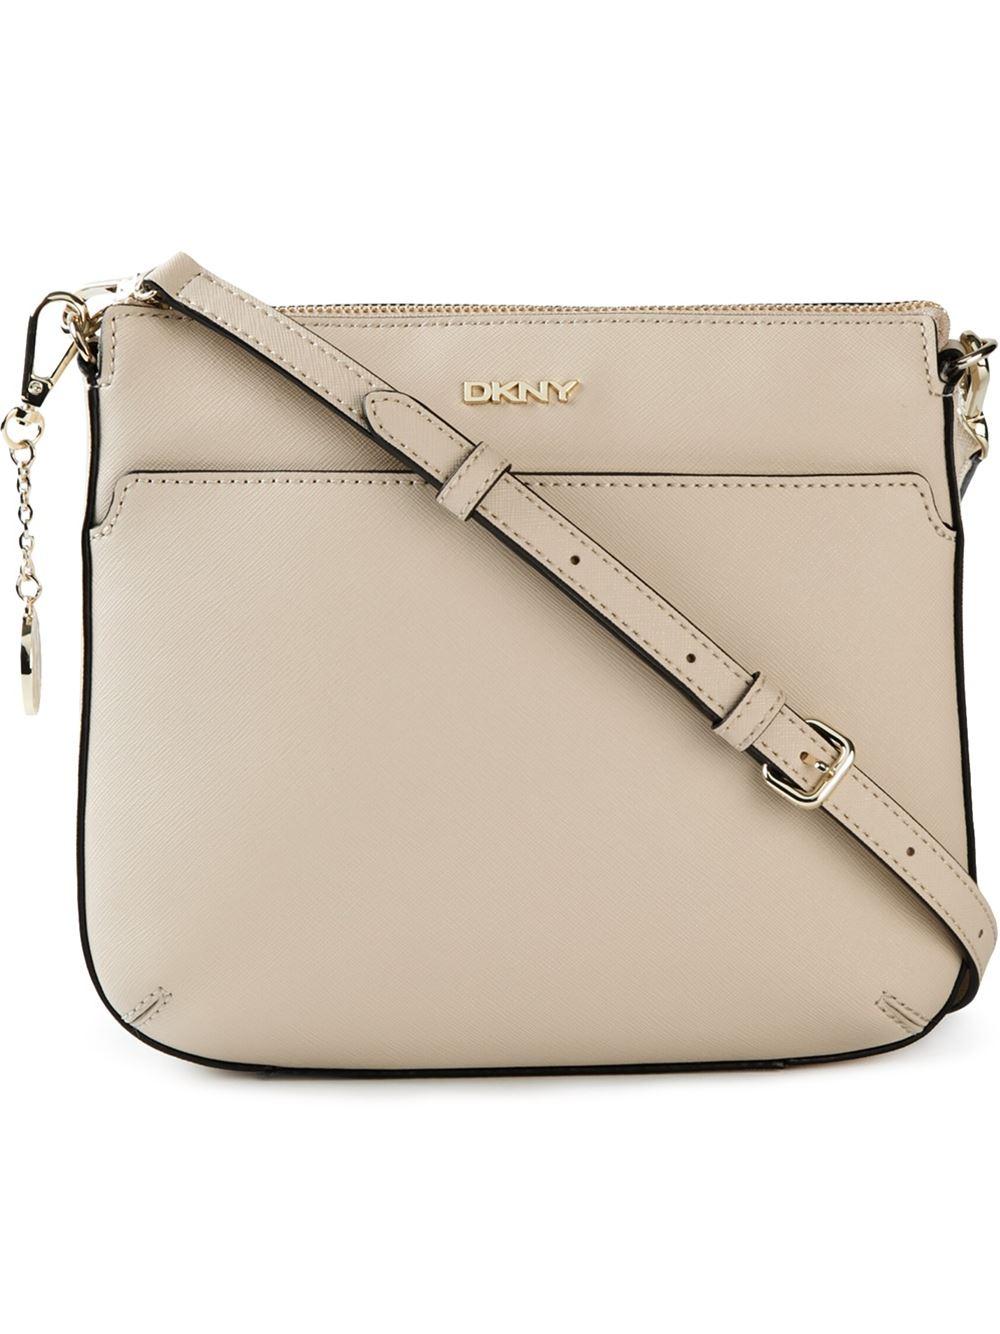 ea603227fa5 DKNY Top Zip Crossbody Bag in Natural - Lyst